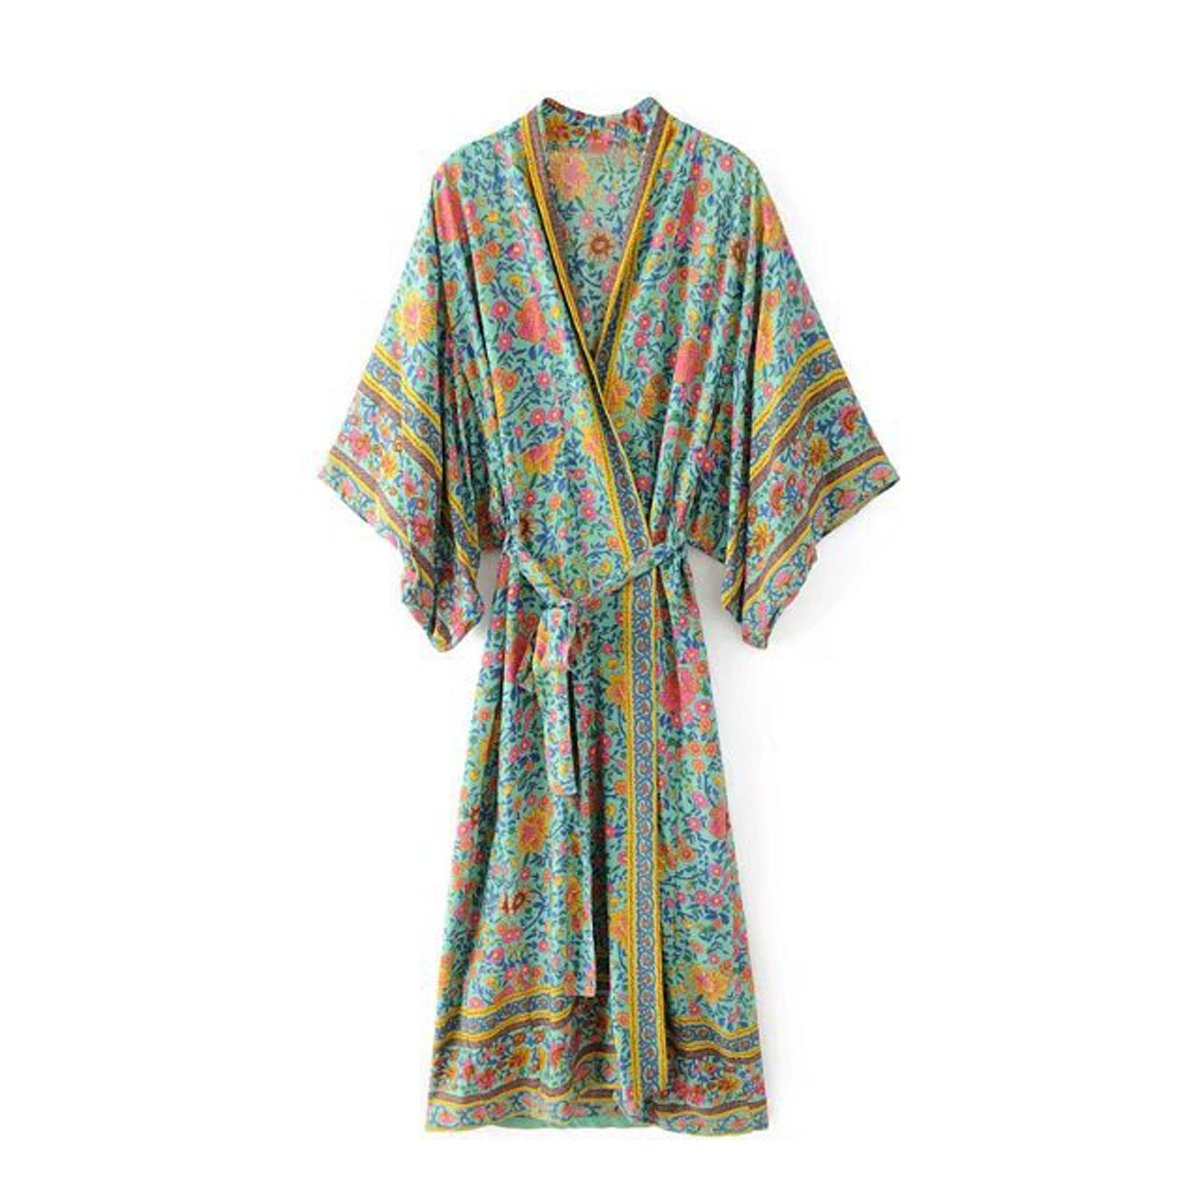 R.Vivimos Women Vintage Floral Print Beach Boho Cardigan Kimono Maxi Swimwear Cover up Dress Wrap Small